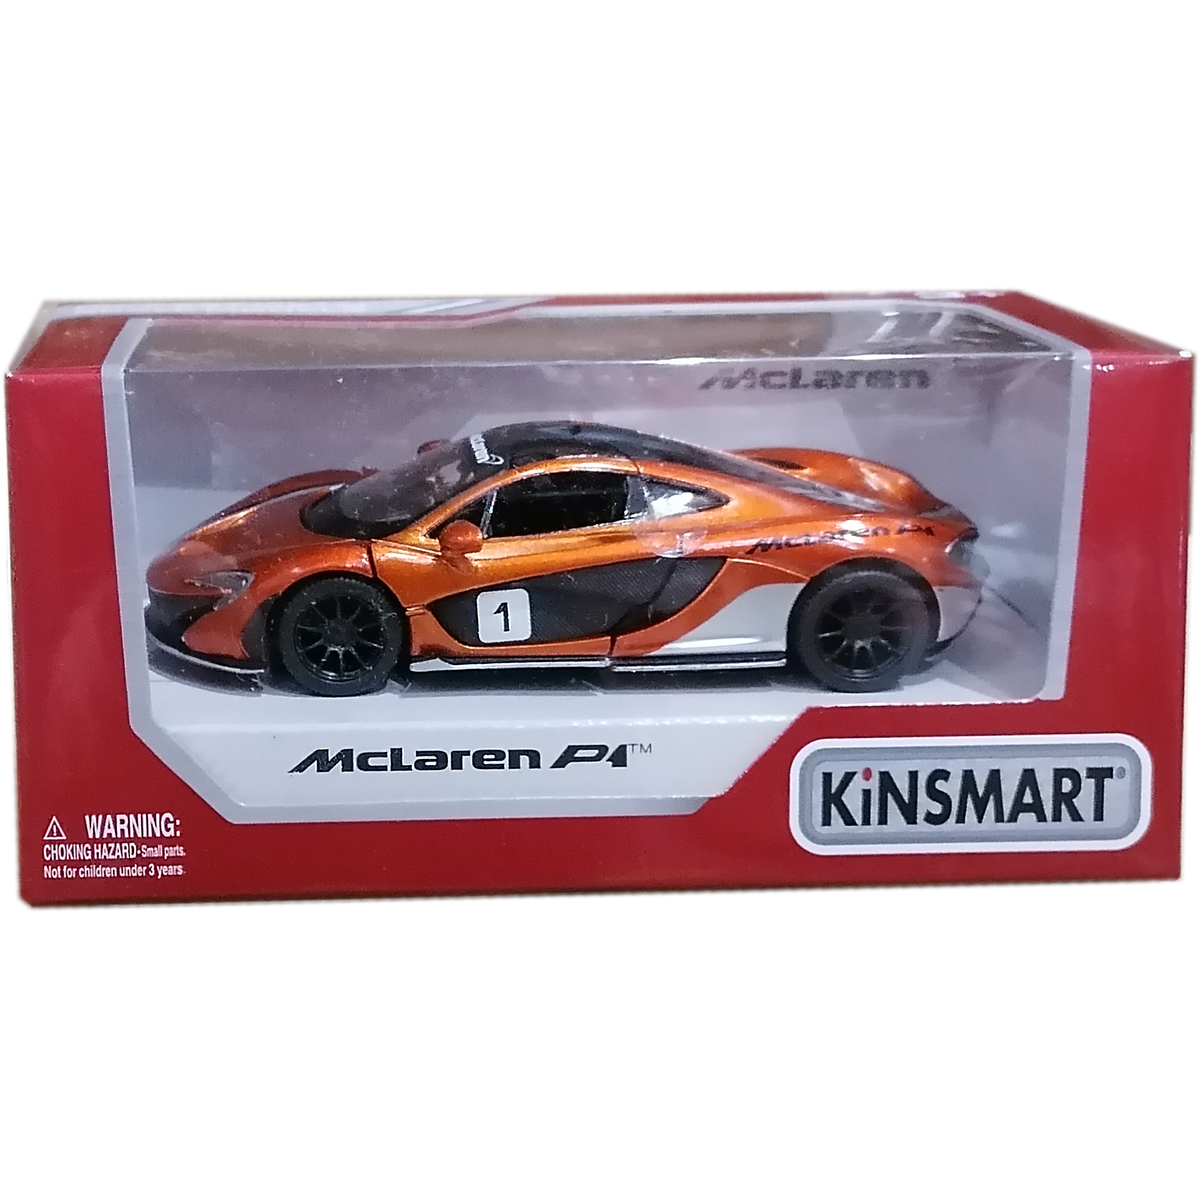 Masinuta din metal Kinsmart, McLaren P1, Portocaliu